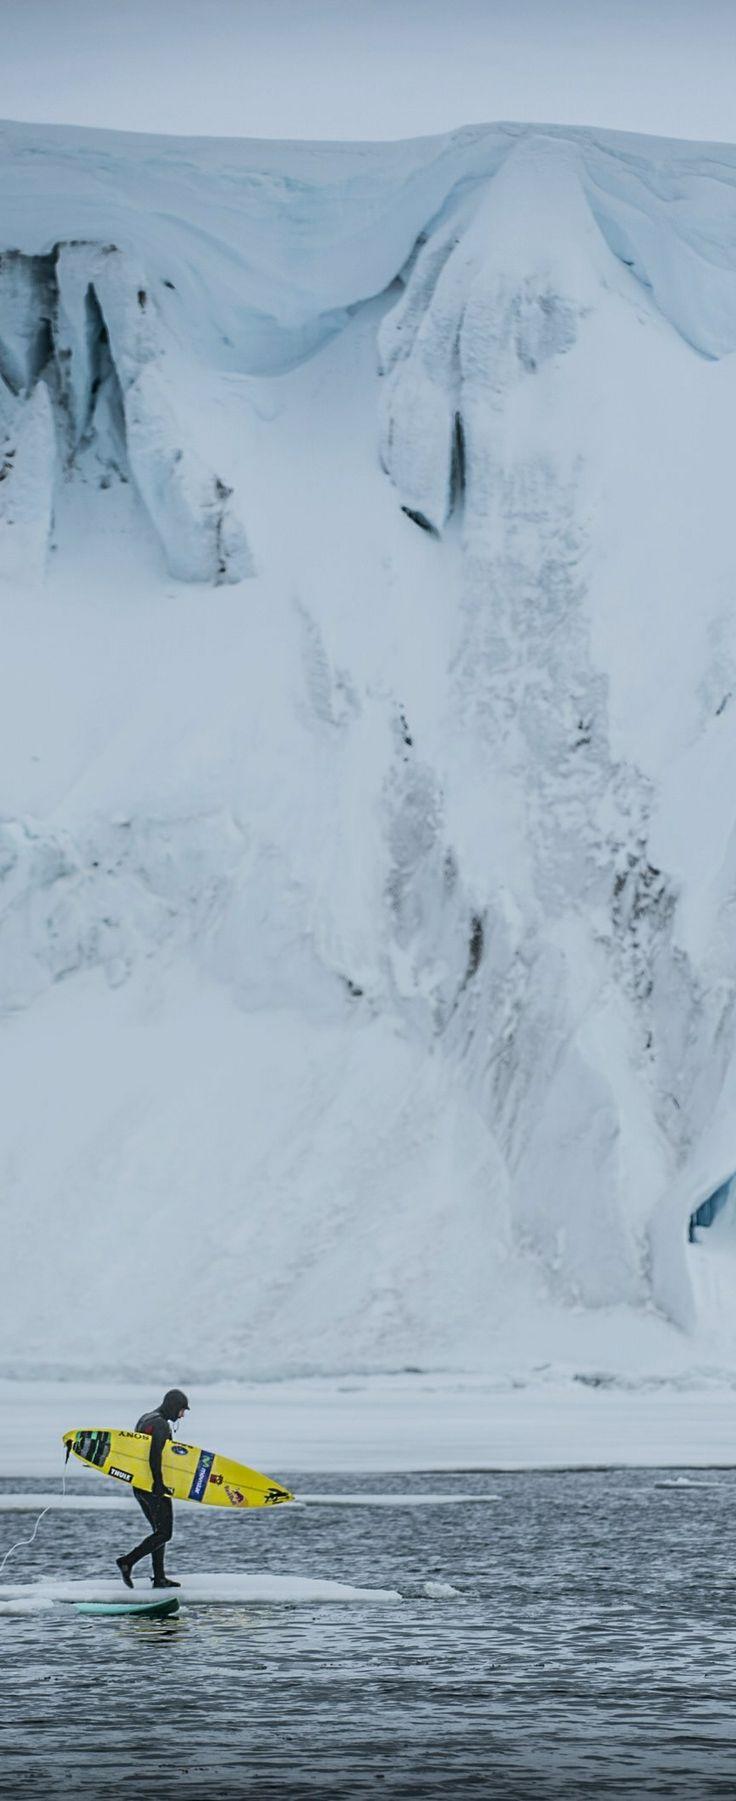 Cold front. Ramon Navarro is Surfing Antarctica. #surf #snow #damncold  Image: Alfredo Escobar